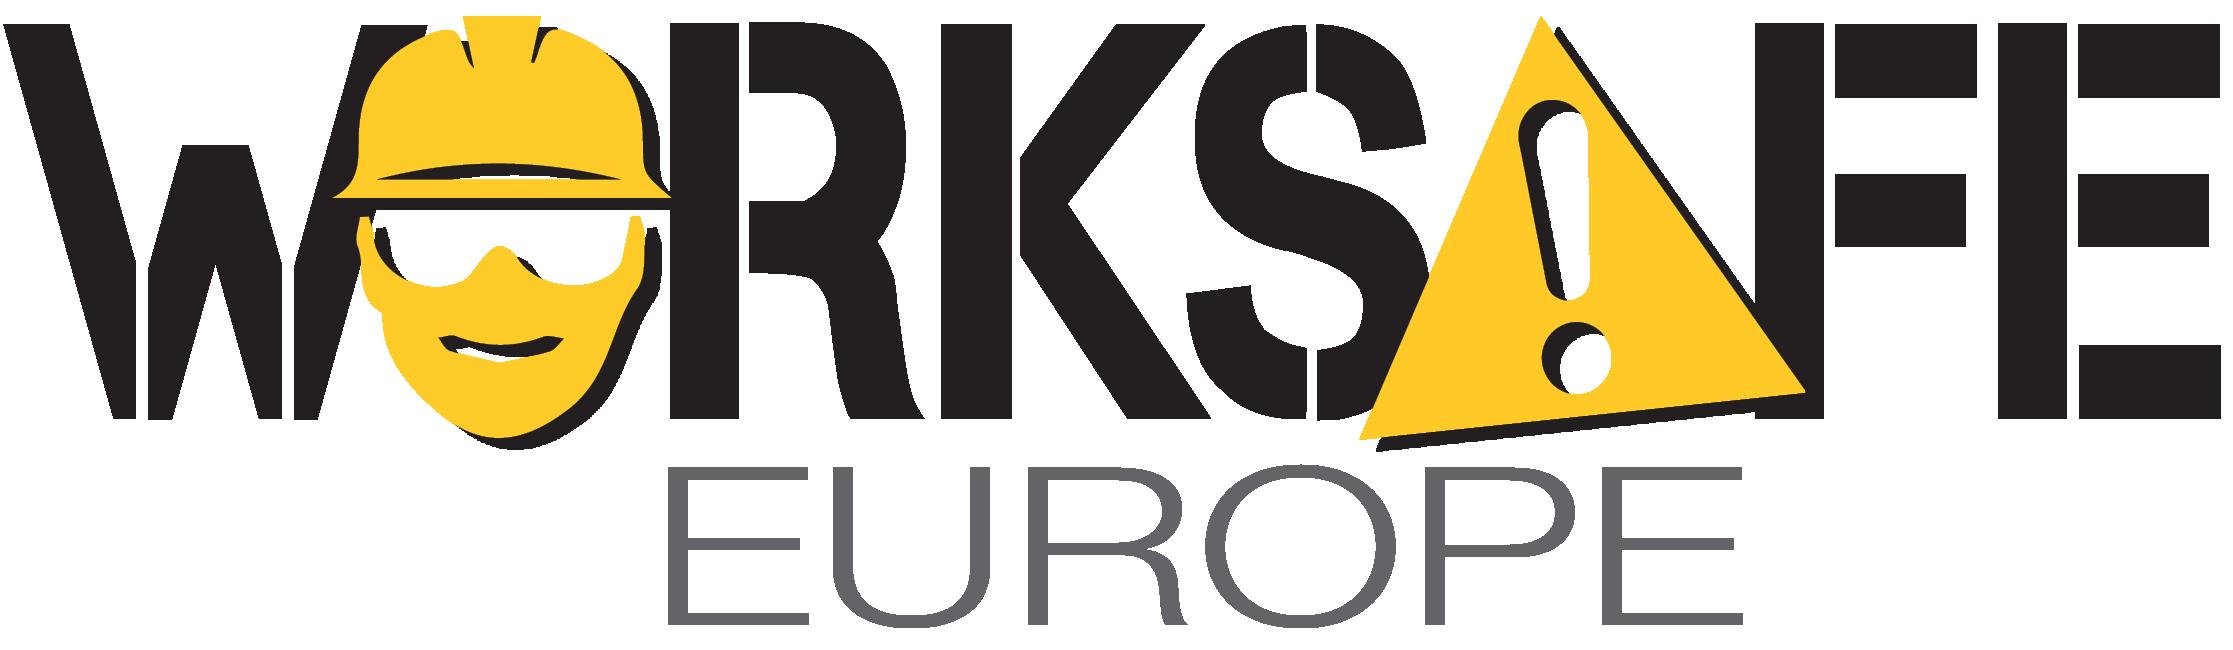 Worksafe Europe